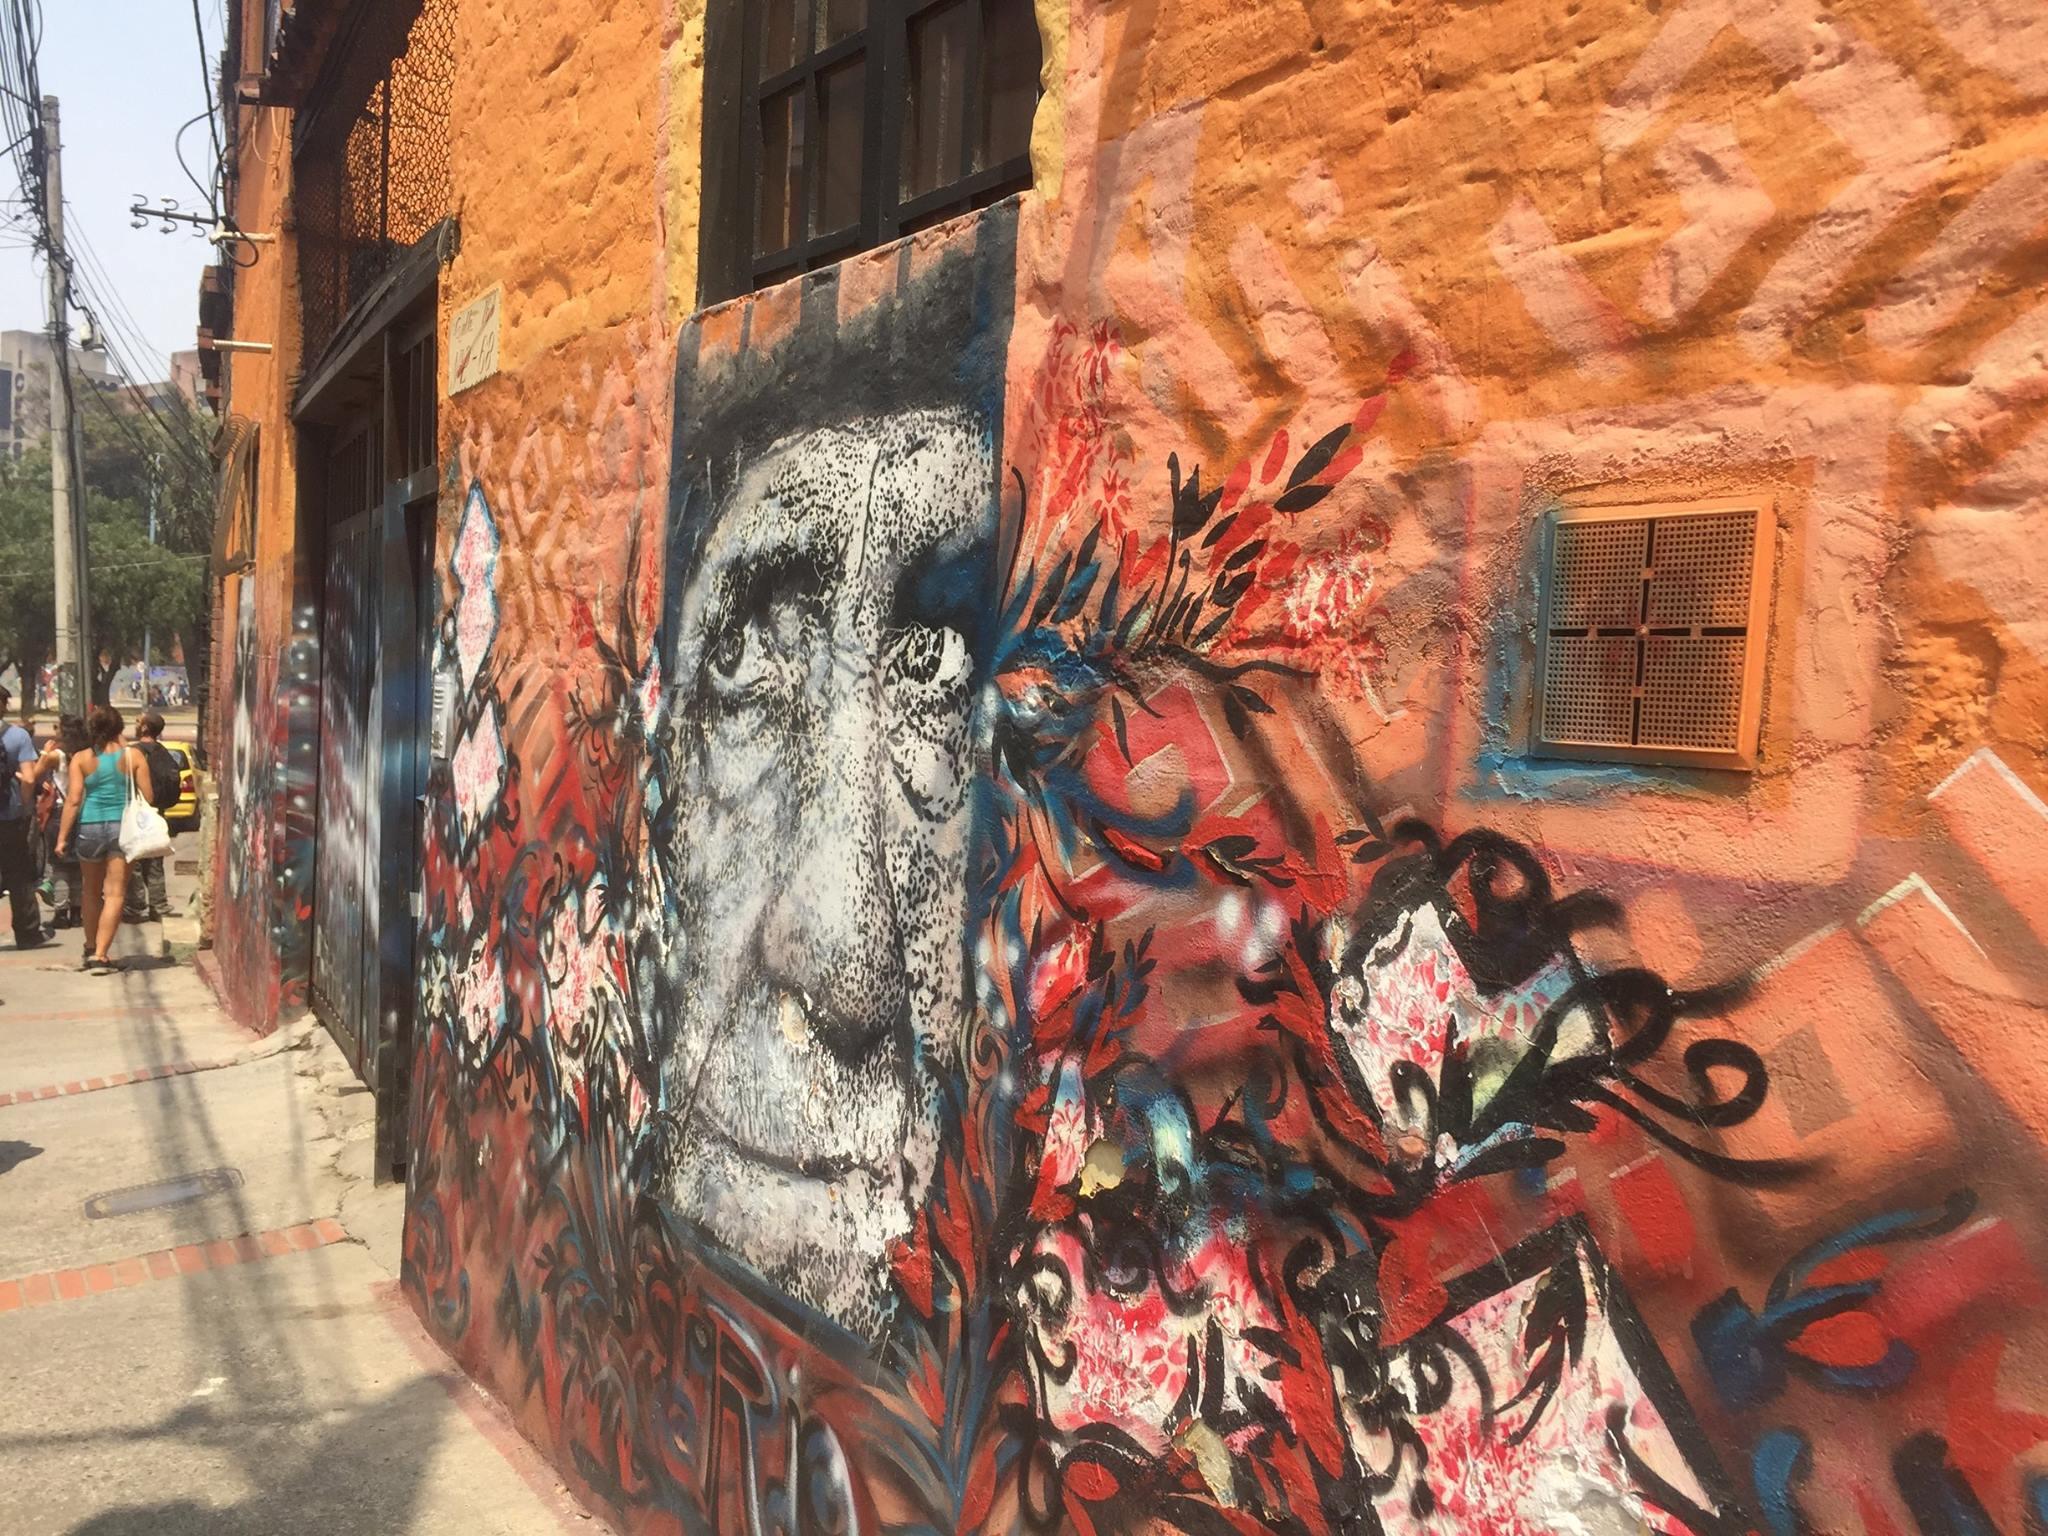 Unreal graffiti in the Colombian capital.